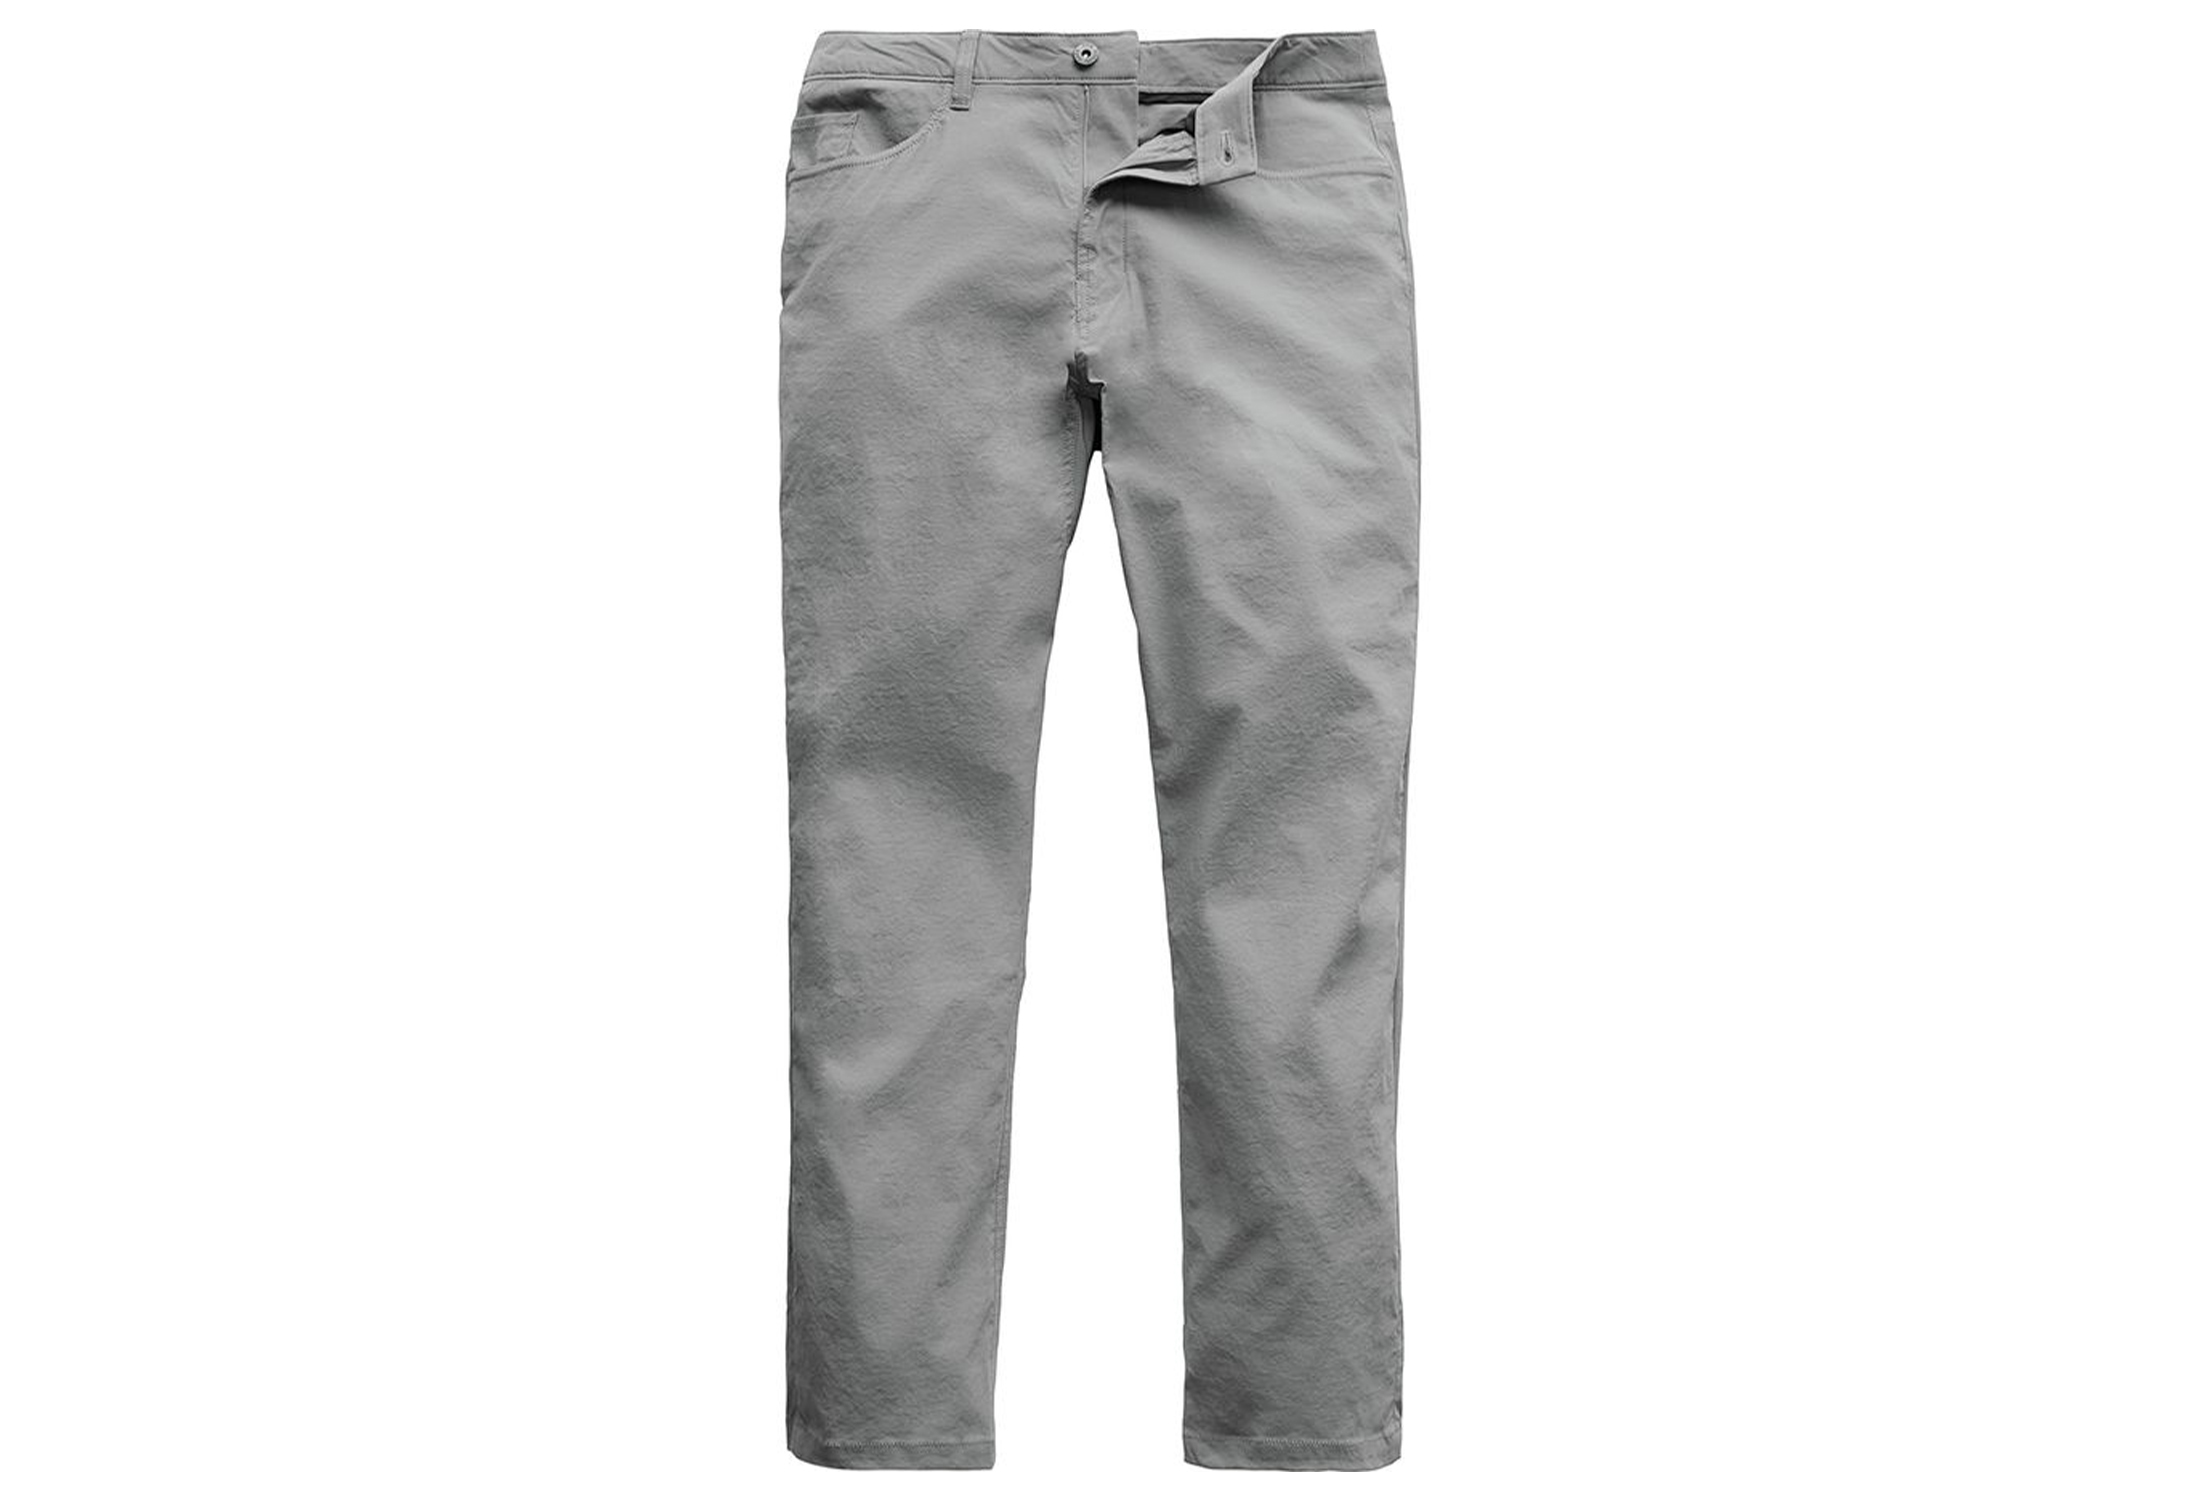 sprag pants